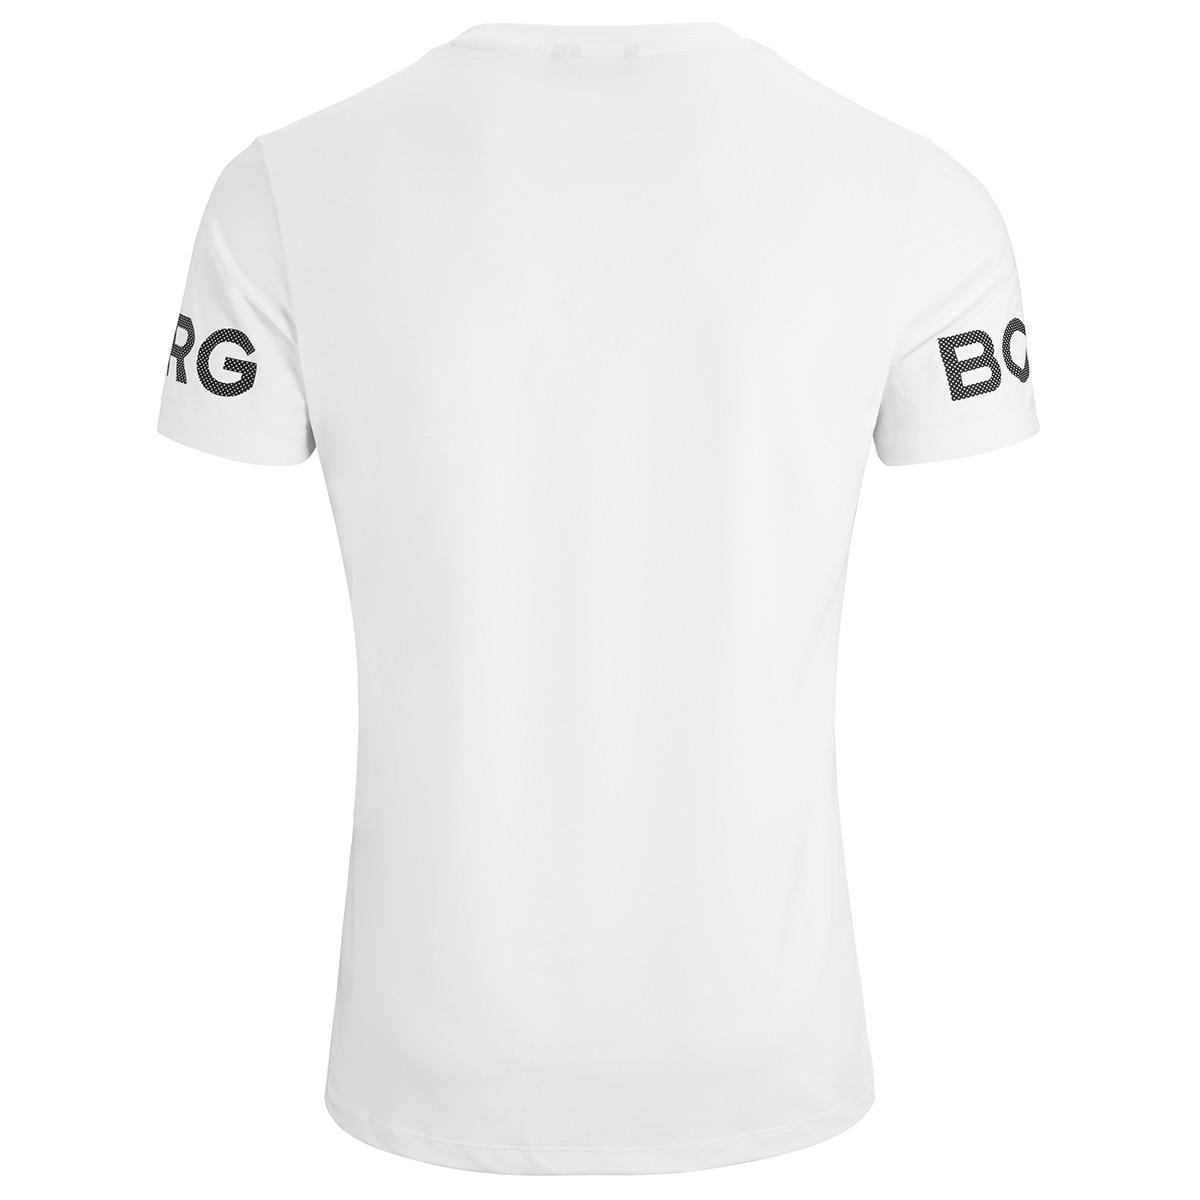 Bjorn Borg Mens 2019 Borg Tee Training Dyed Borg Print T-Shirt 29/% OFF RRP